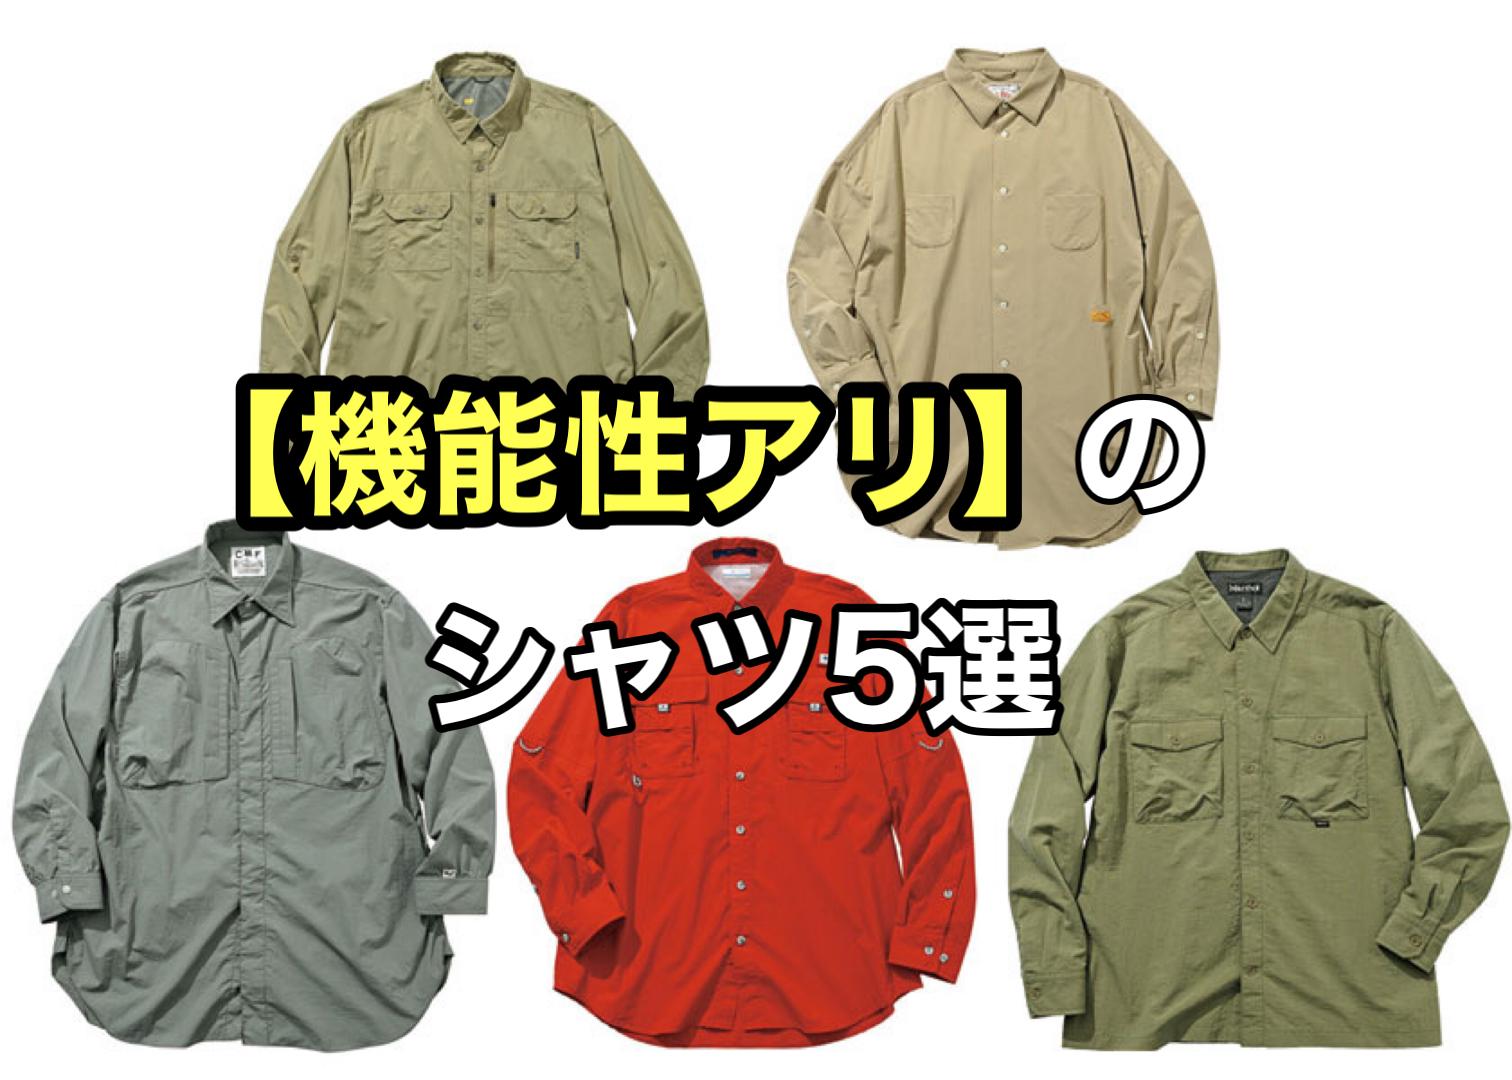 https://cdn.fineboys-online.jp/thegear/content/theme/img/org/article/3639/main.jpg?t=1634295391